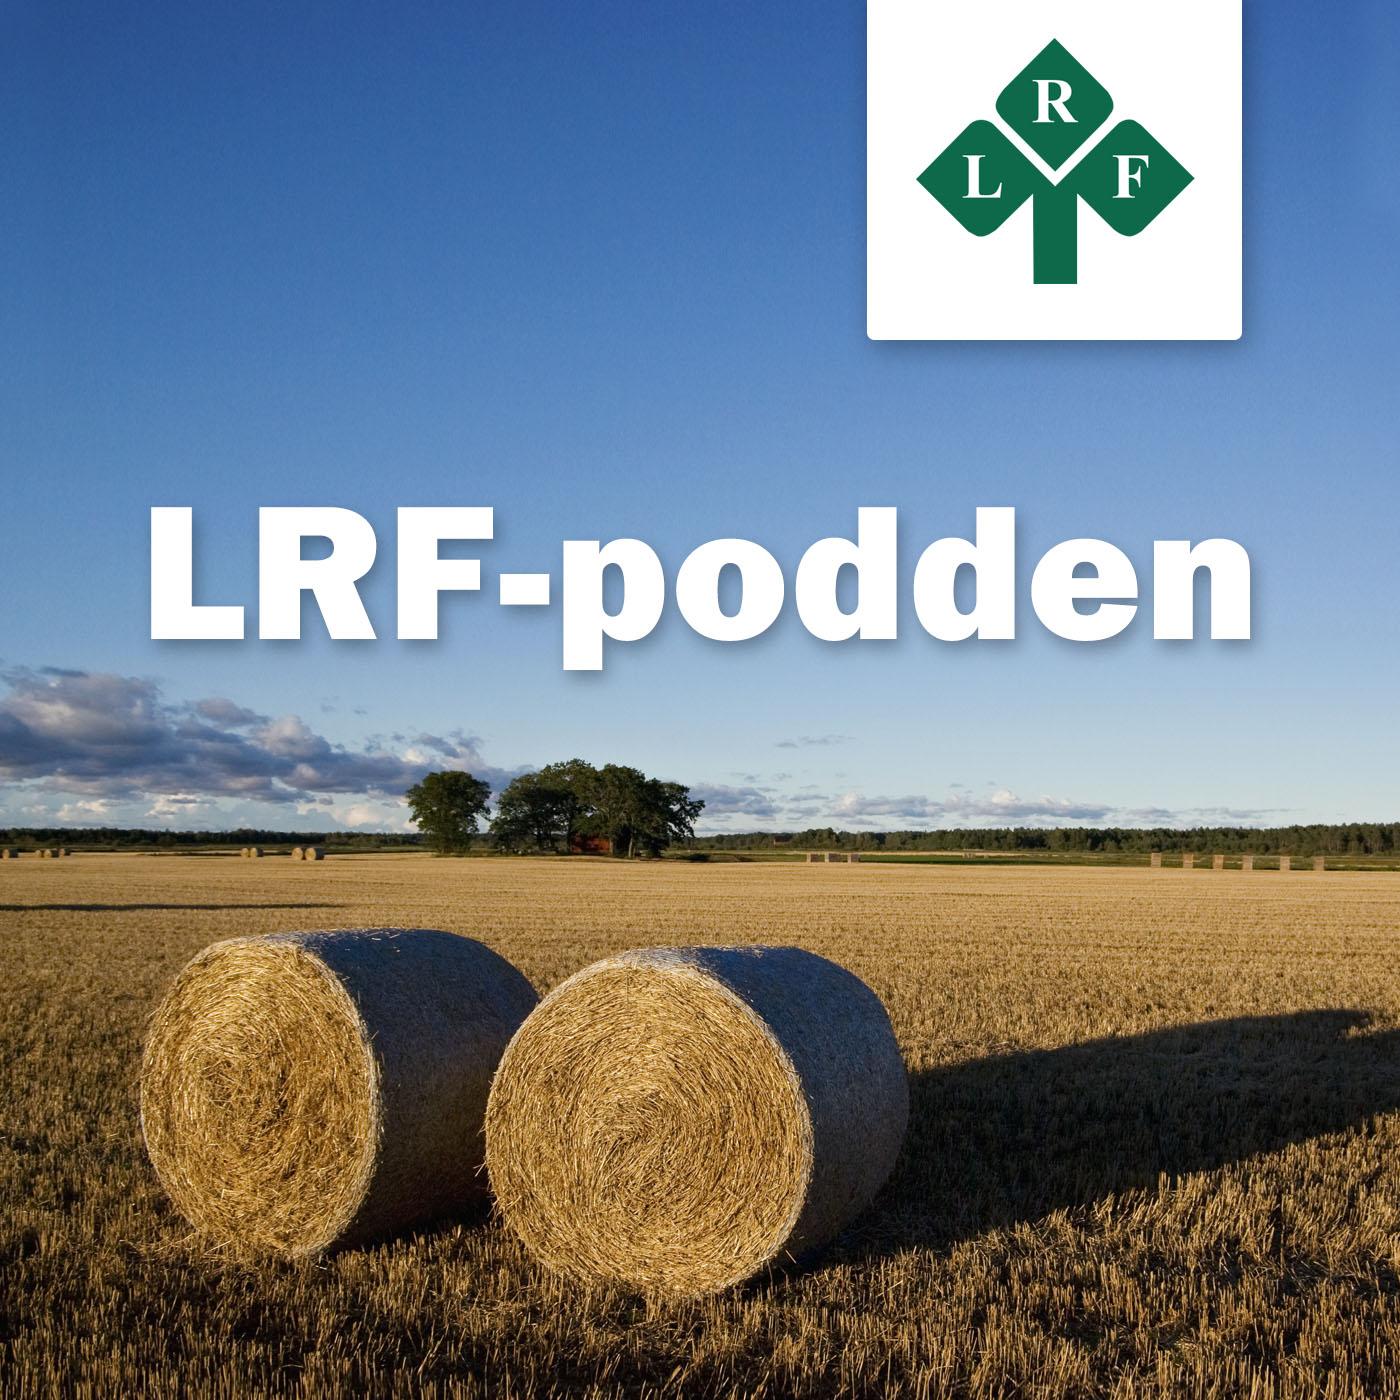 LRF Podden